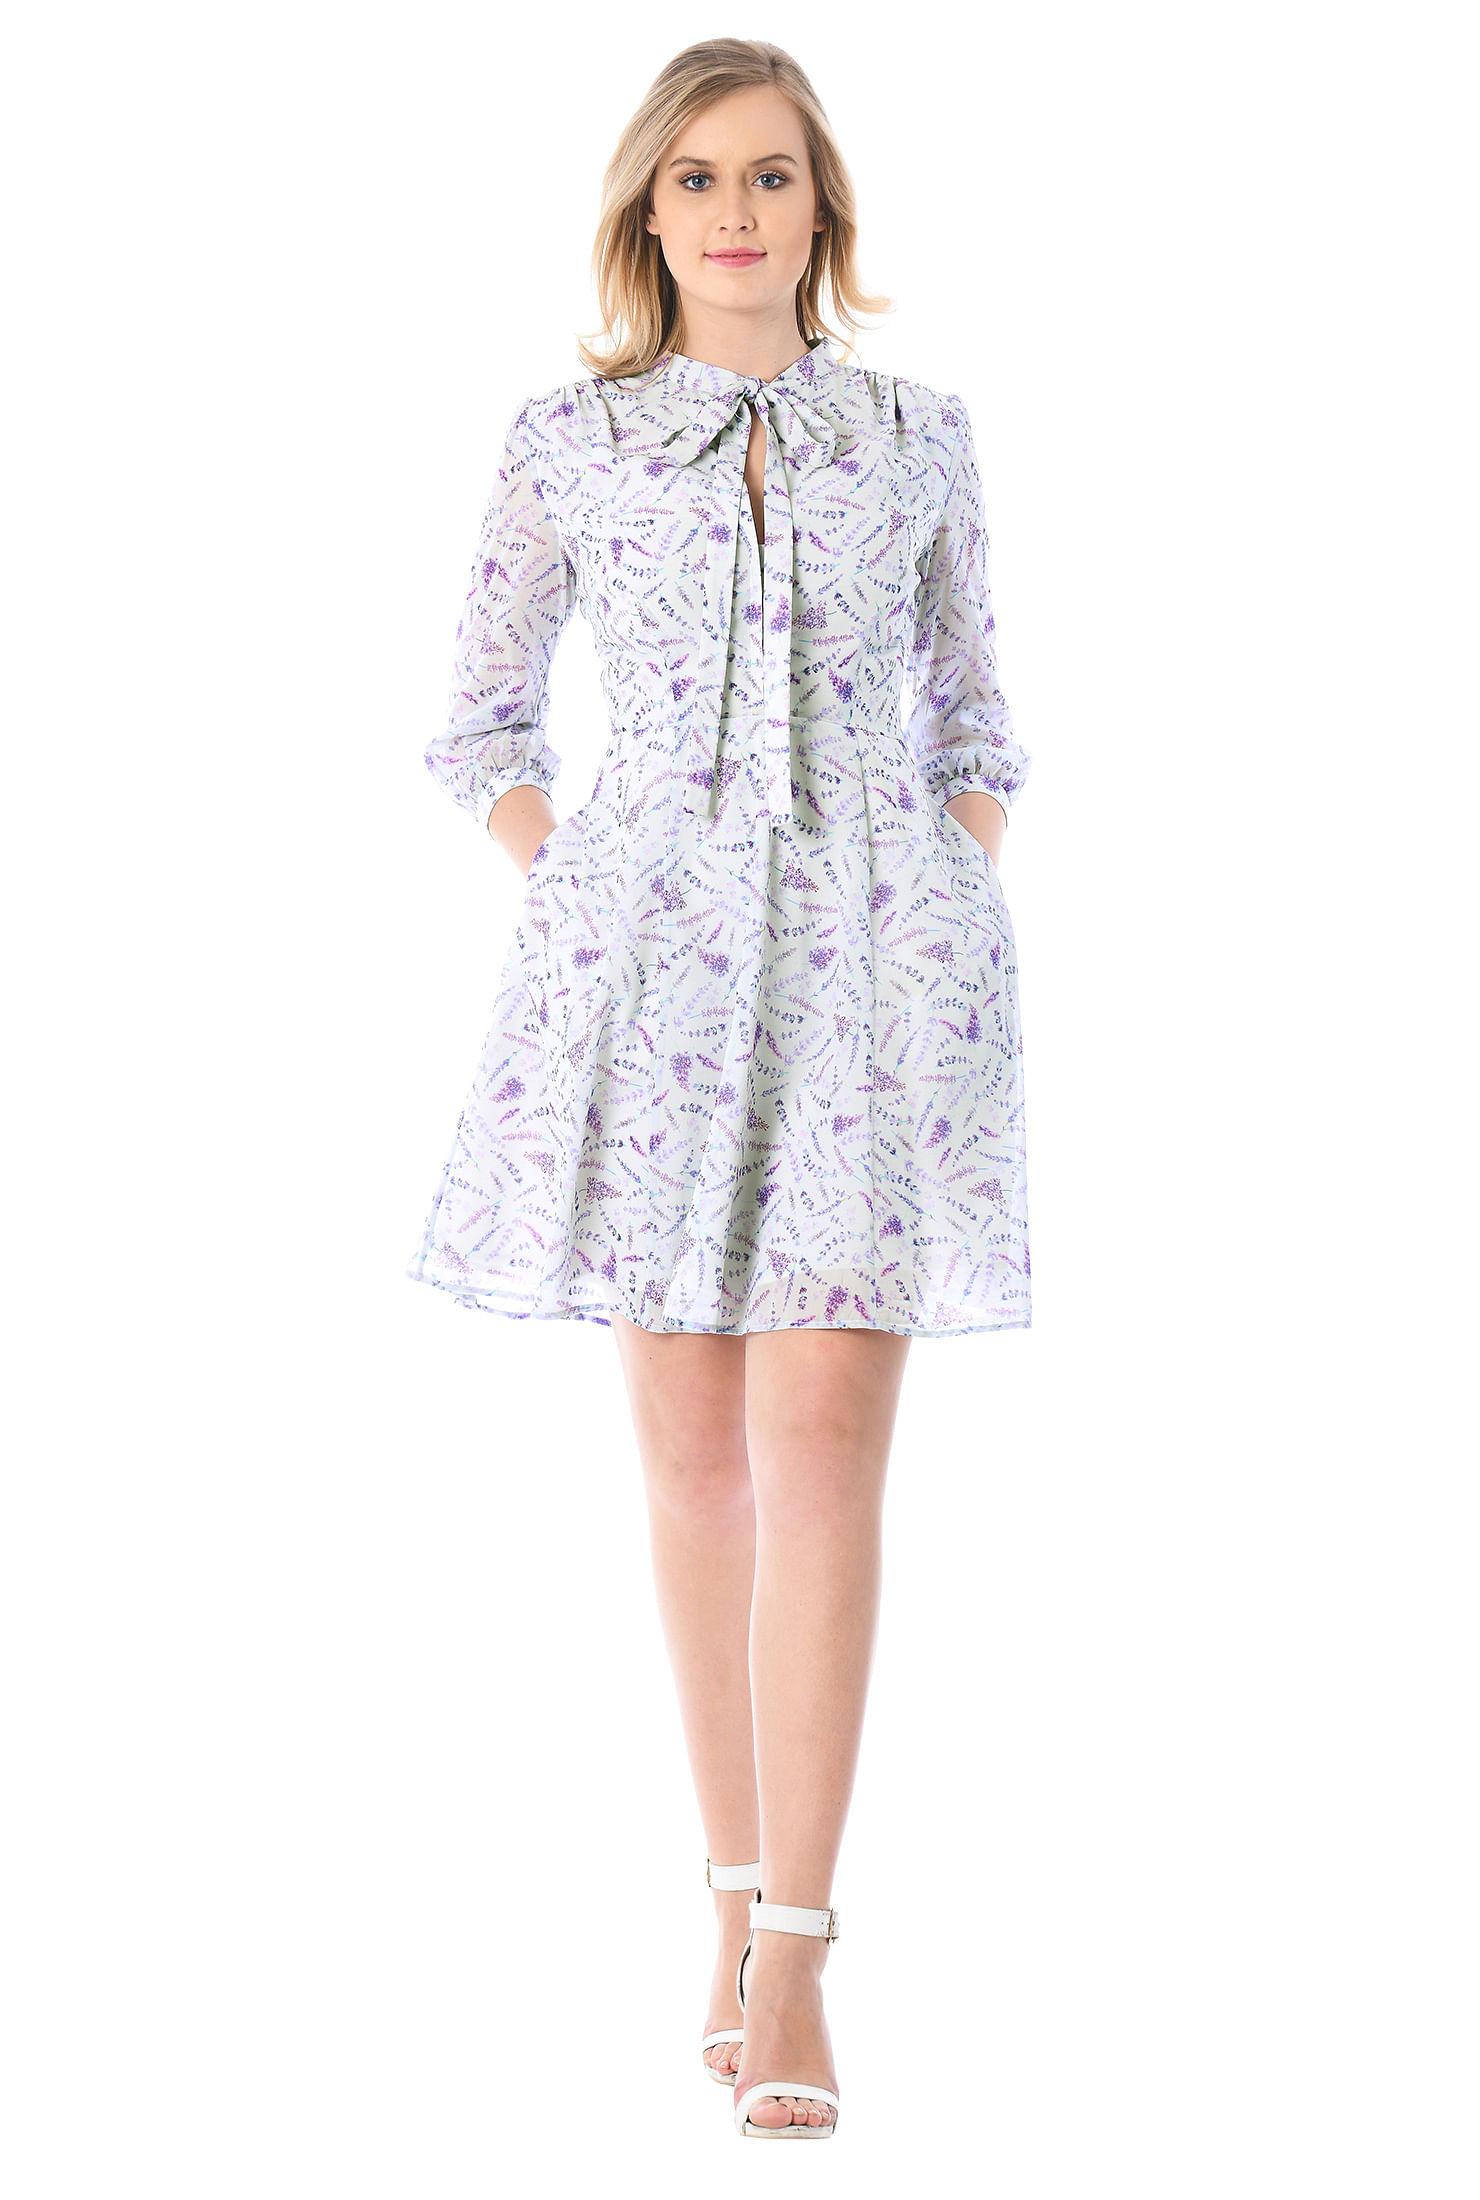 Tops Lavender Dress